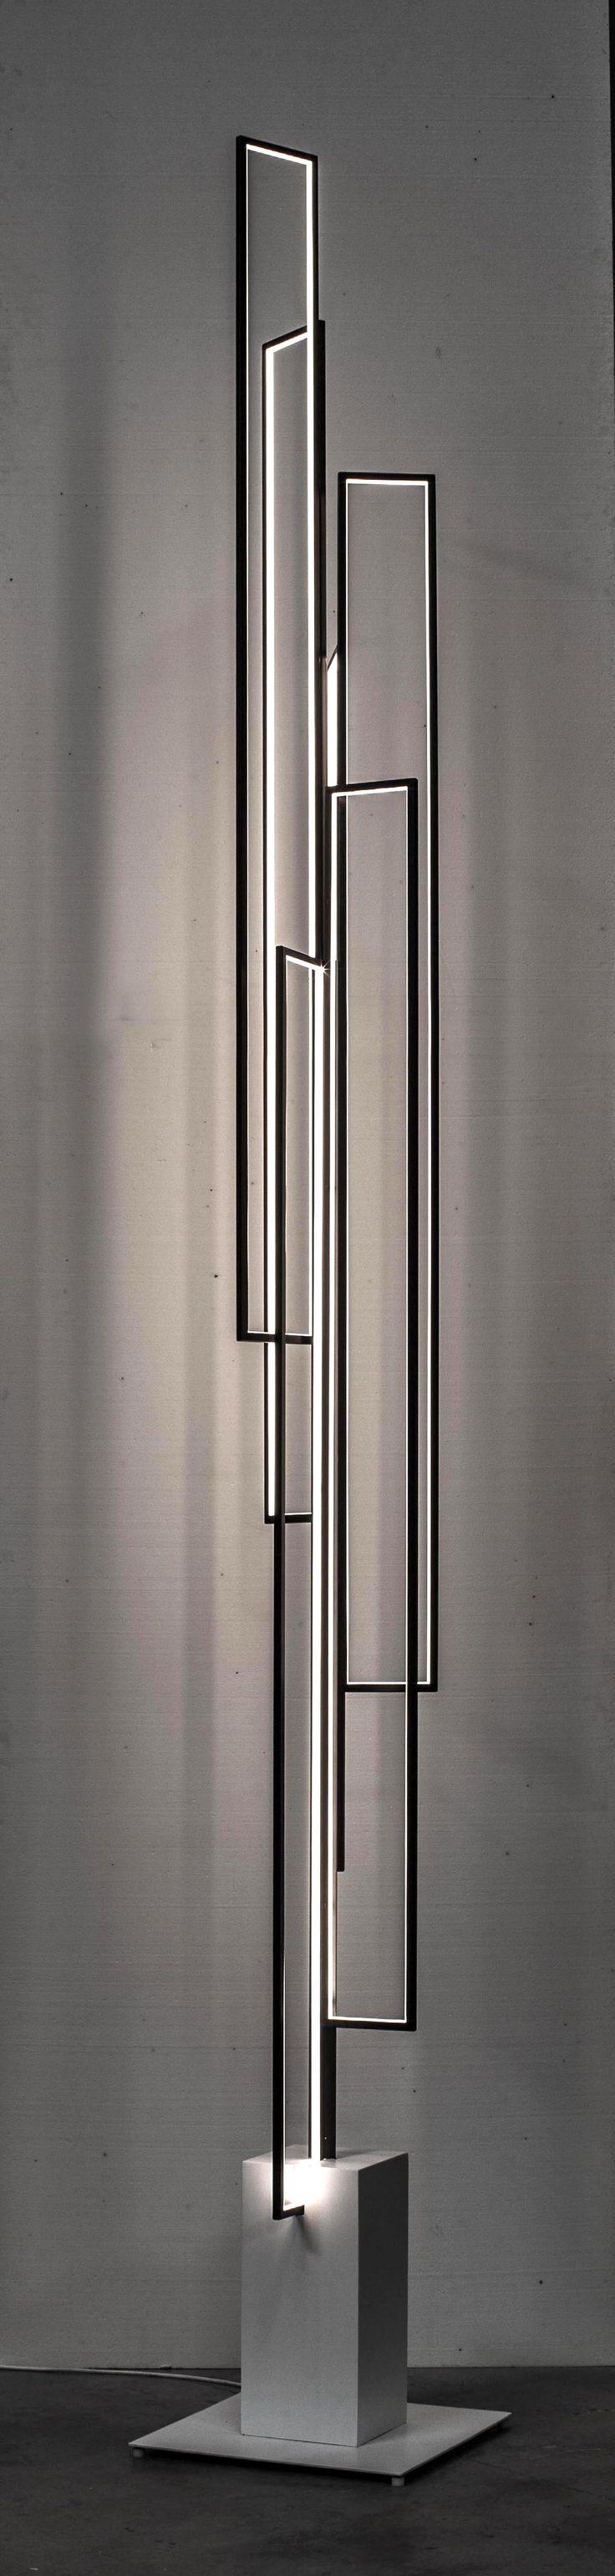 Contemporary LED Mire Vertigo Lighting By Michel Cinier Cinier Collection  Contemporary Radiators, Towel Warmers And